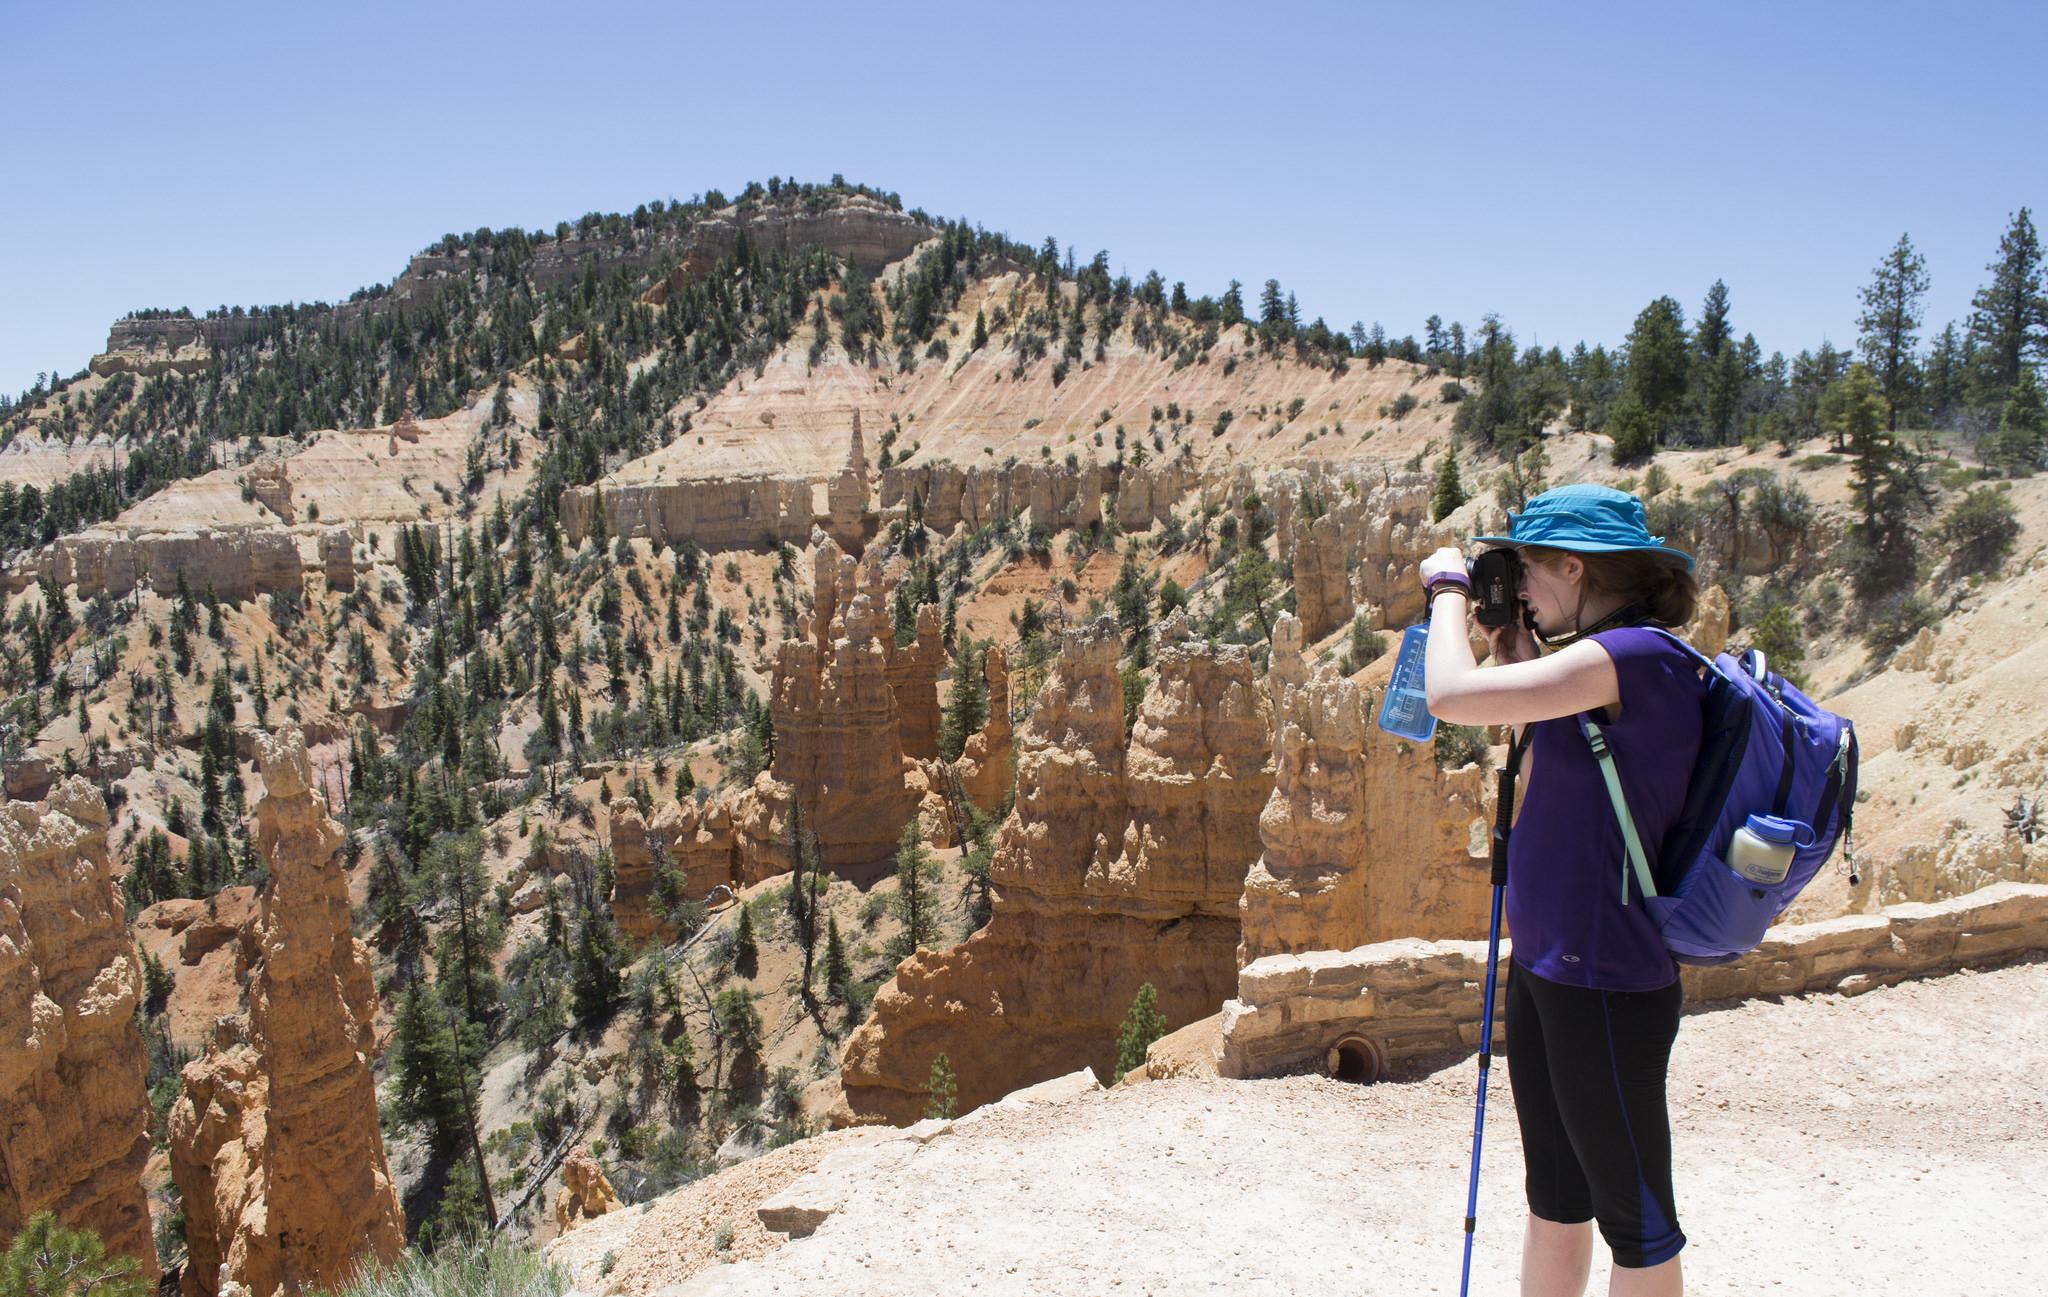 Hiking the rim trail around Bryce Canyon.